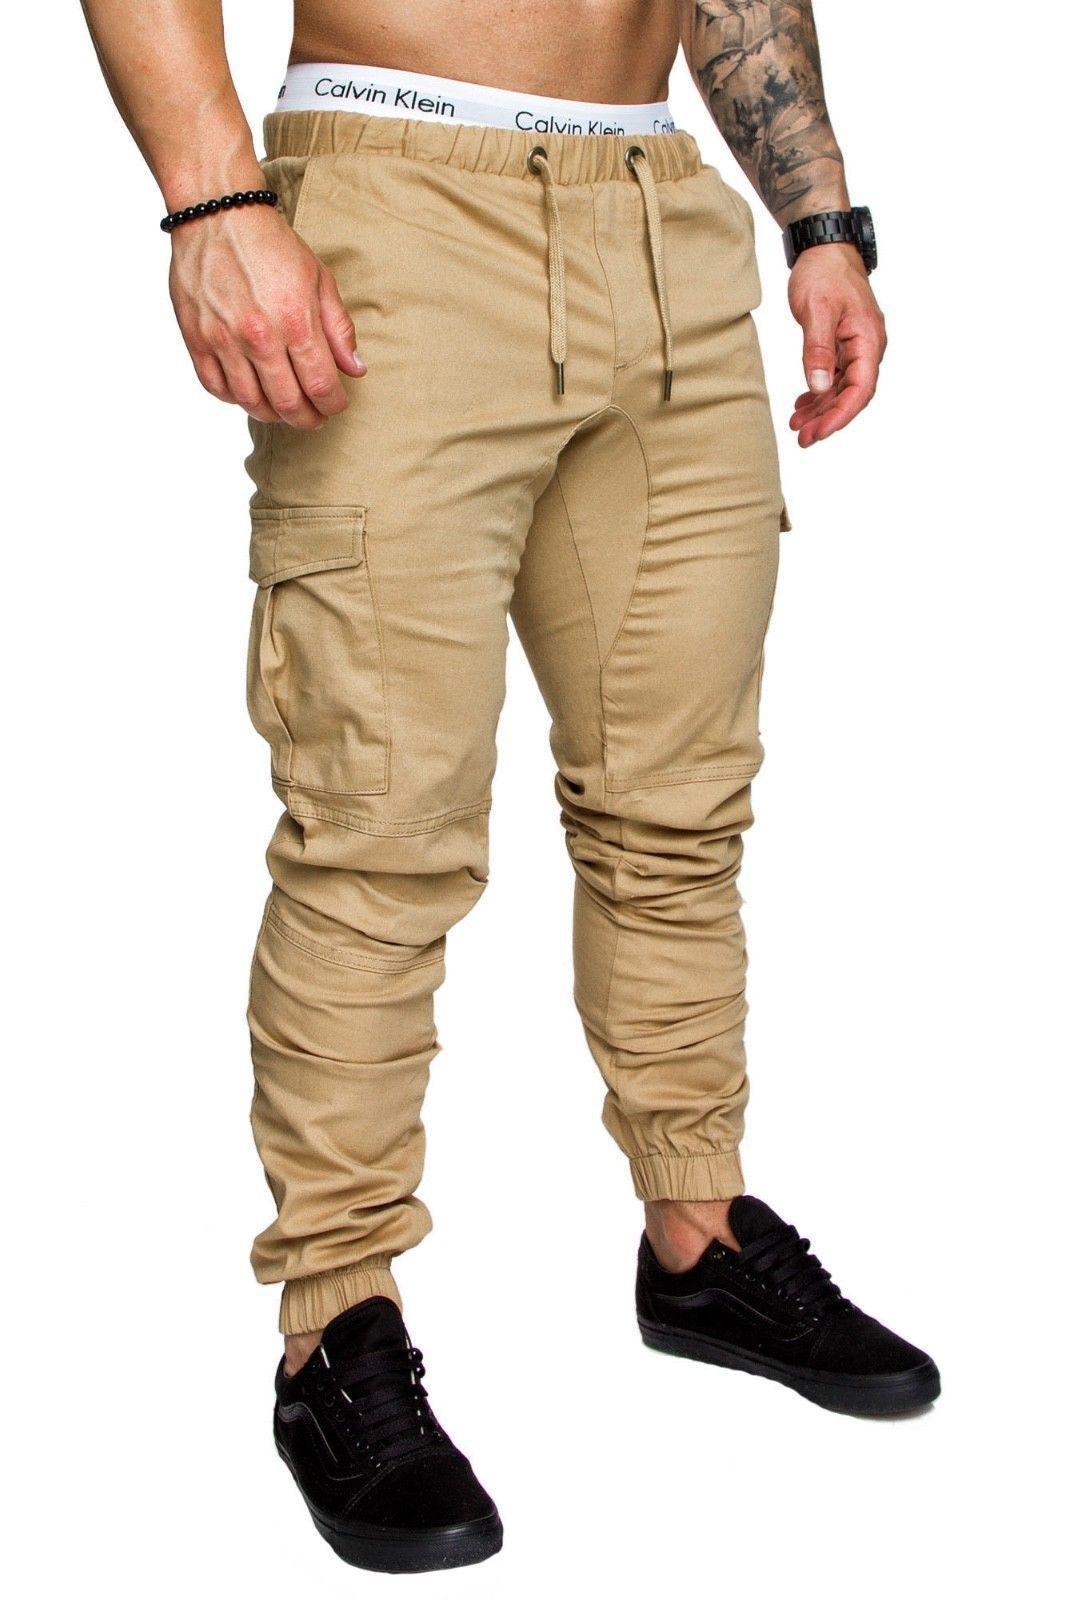 Mode Marke Männer Hosen Schlank Einfarbig Elastizität Männer Casual Hosen Mann Hosen Designer Khaki Mens Jogger M 4XL